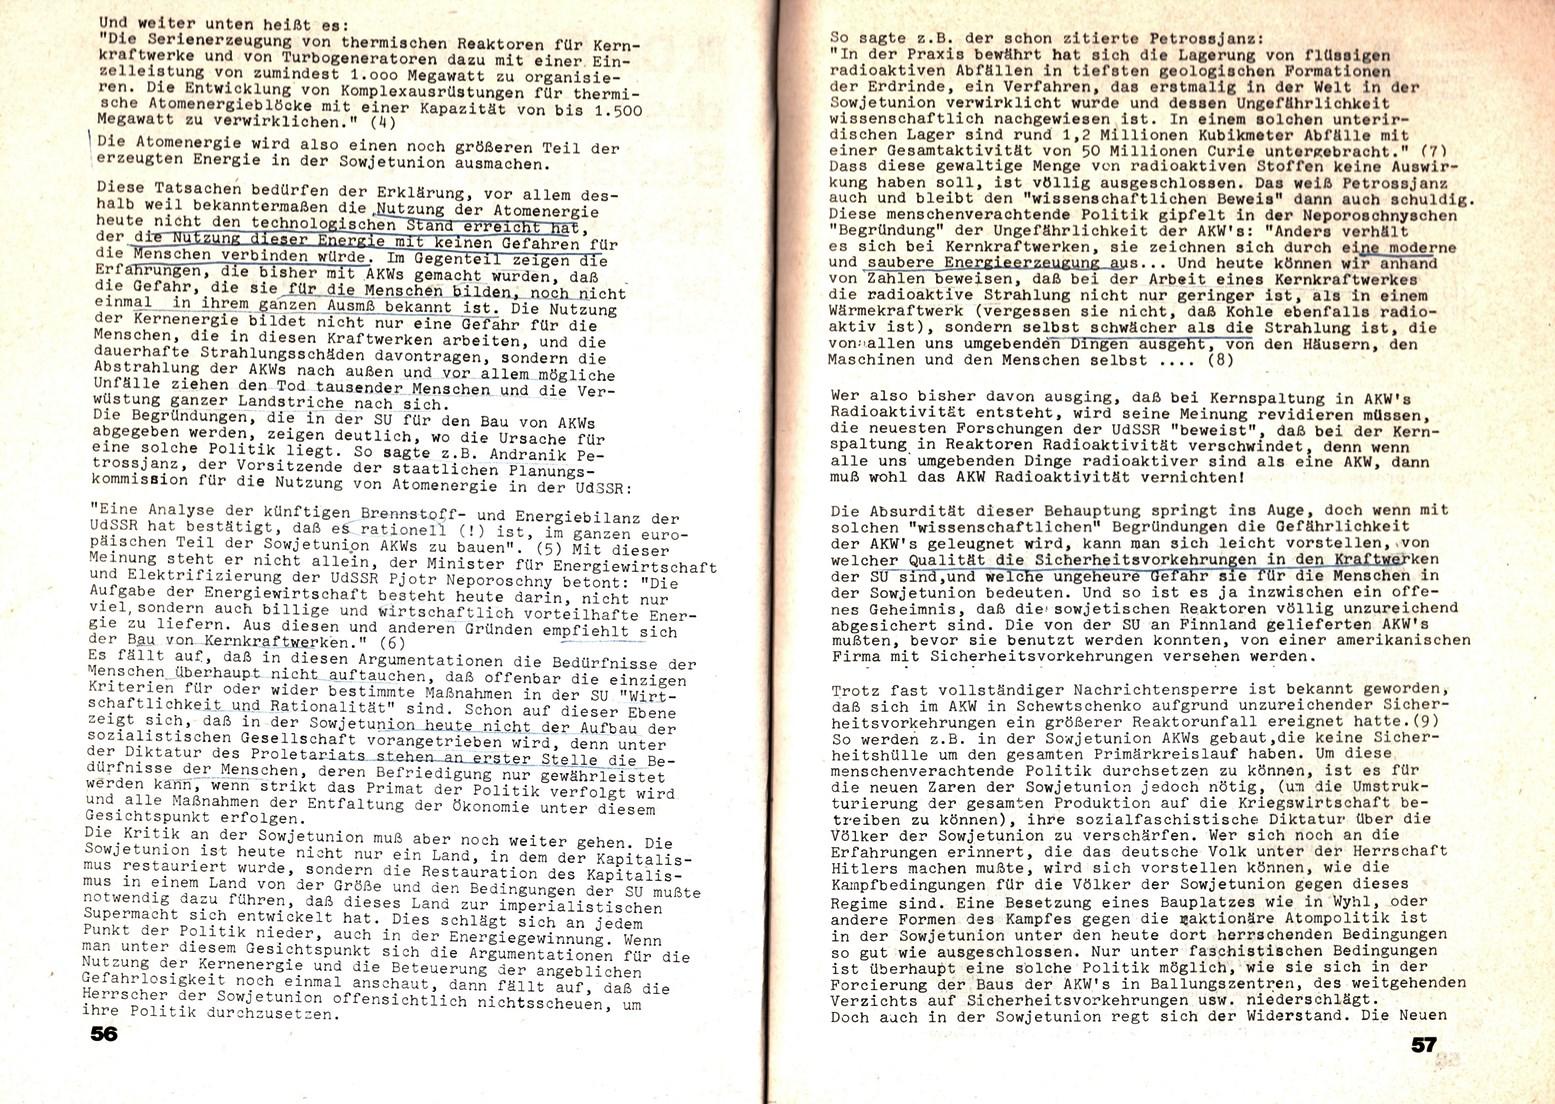 KSV_1976_Atomenergie_im_Kapitalismus_030